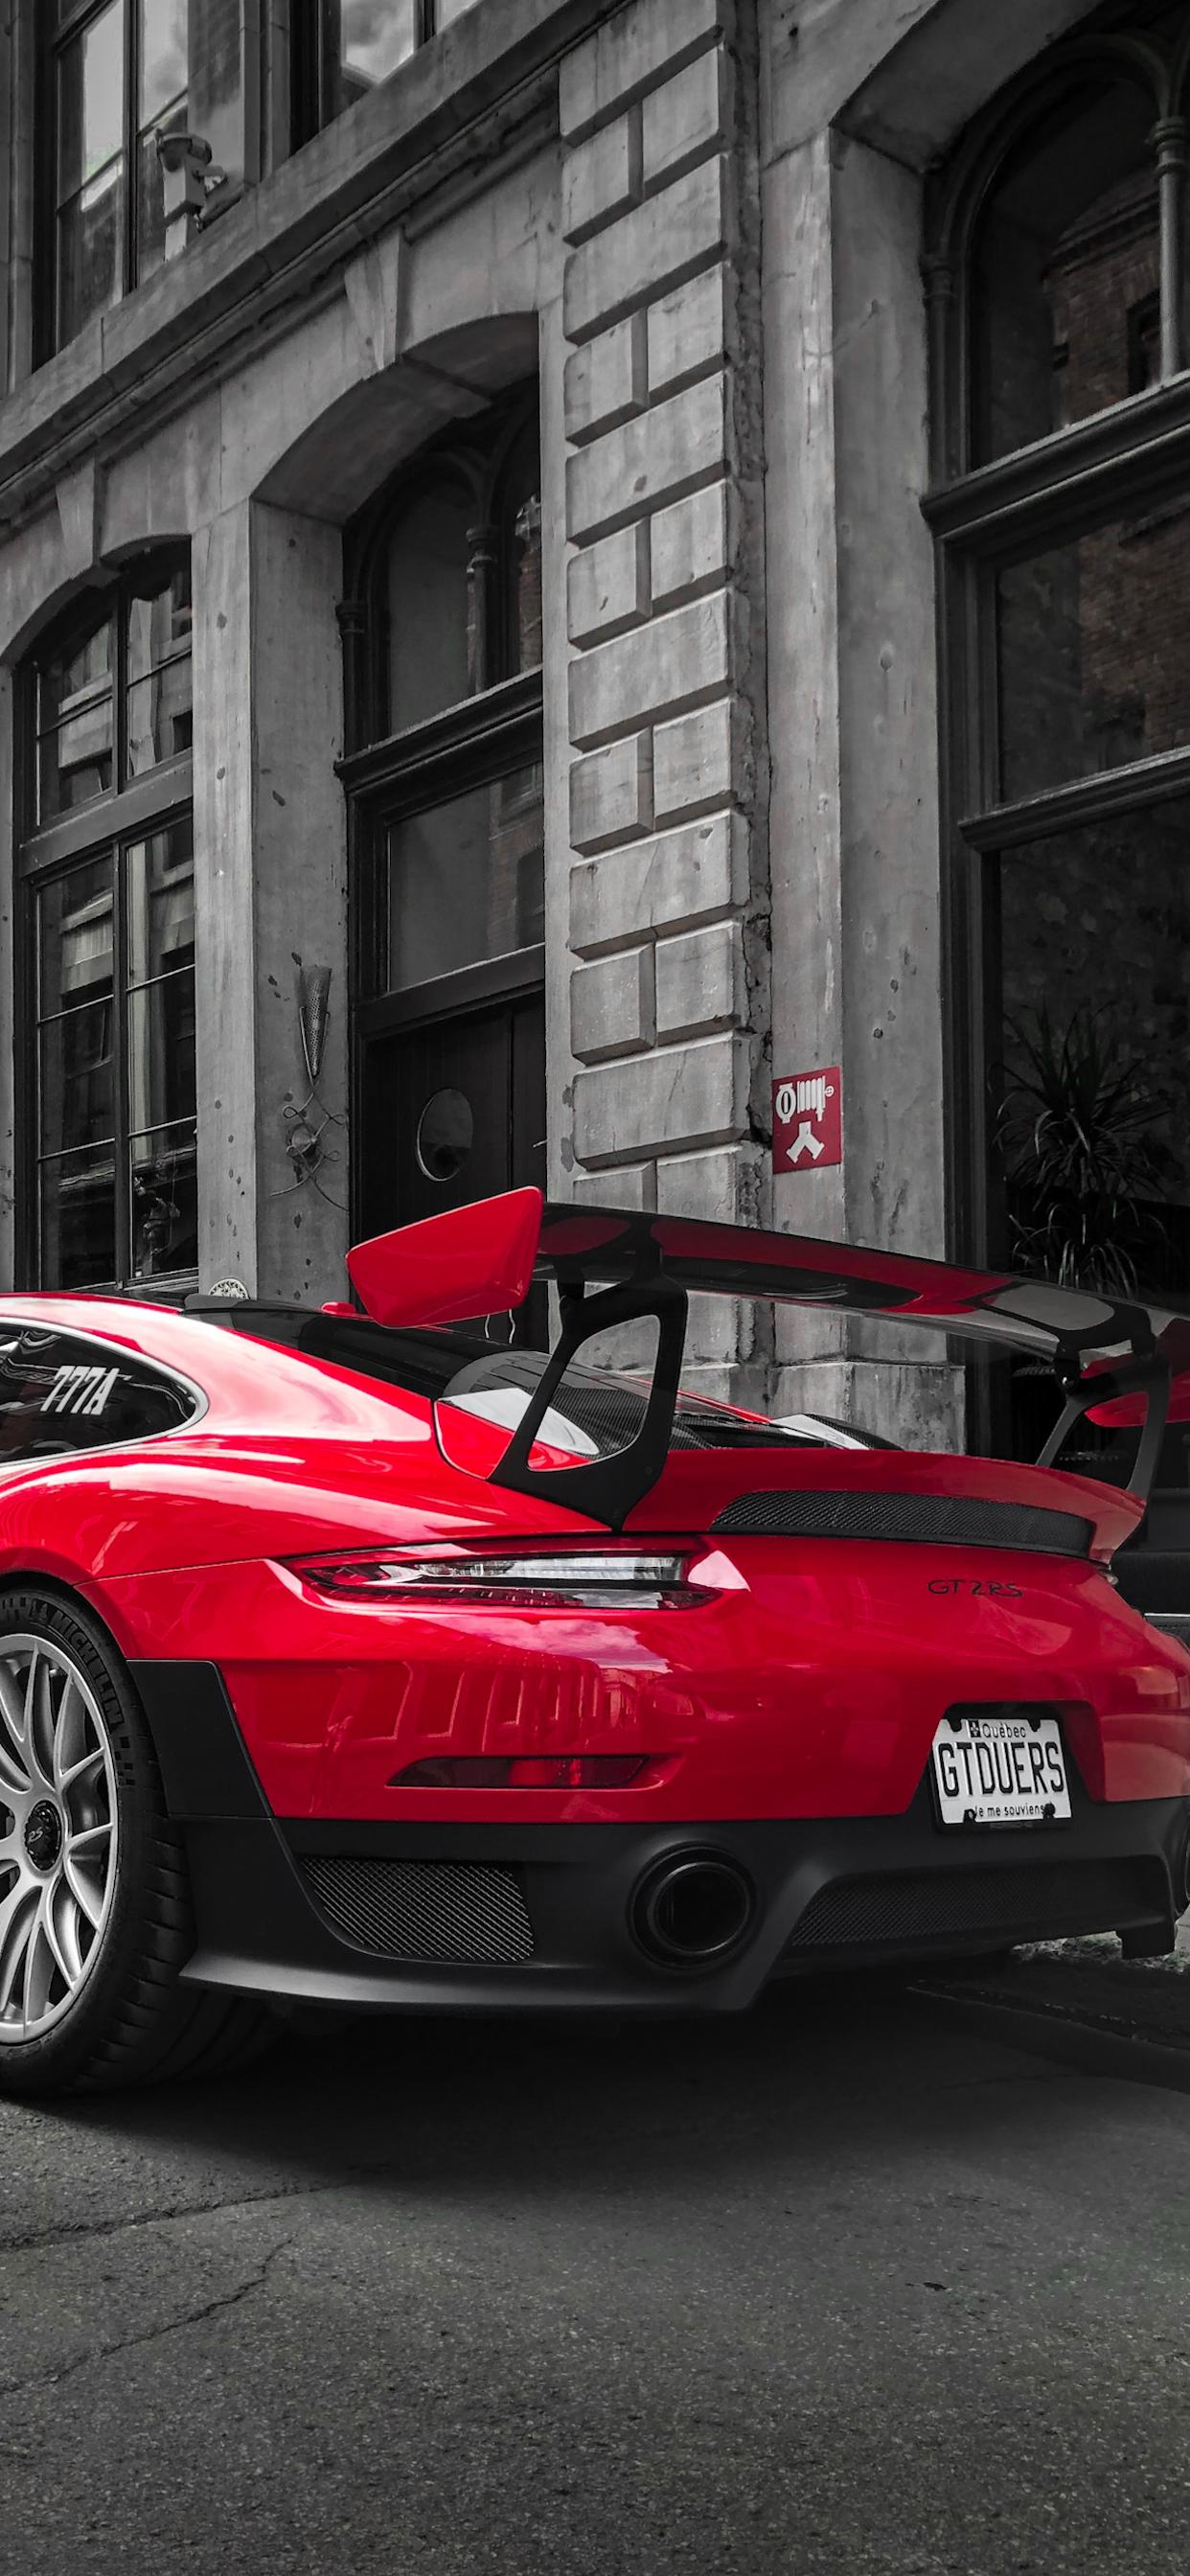 iPhone wallpapers car porsche montreal Porsche